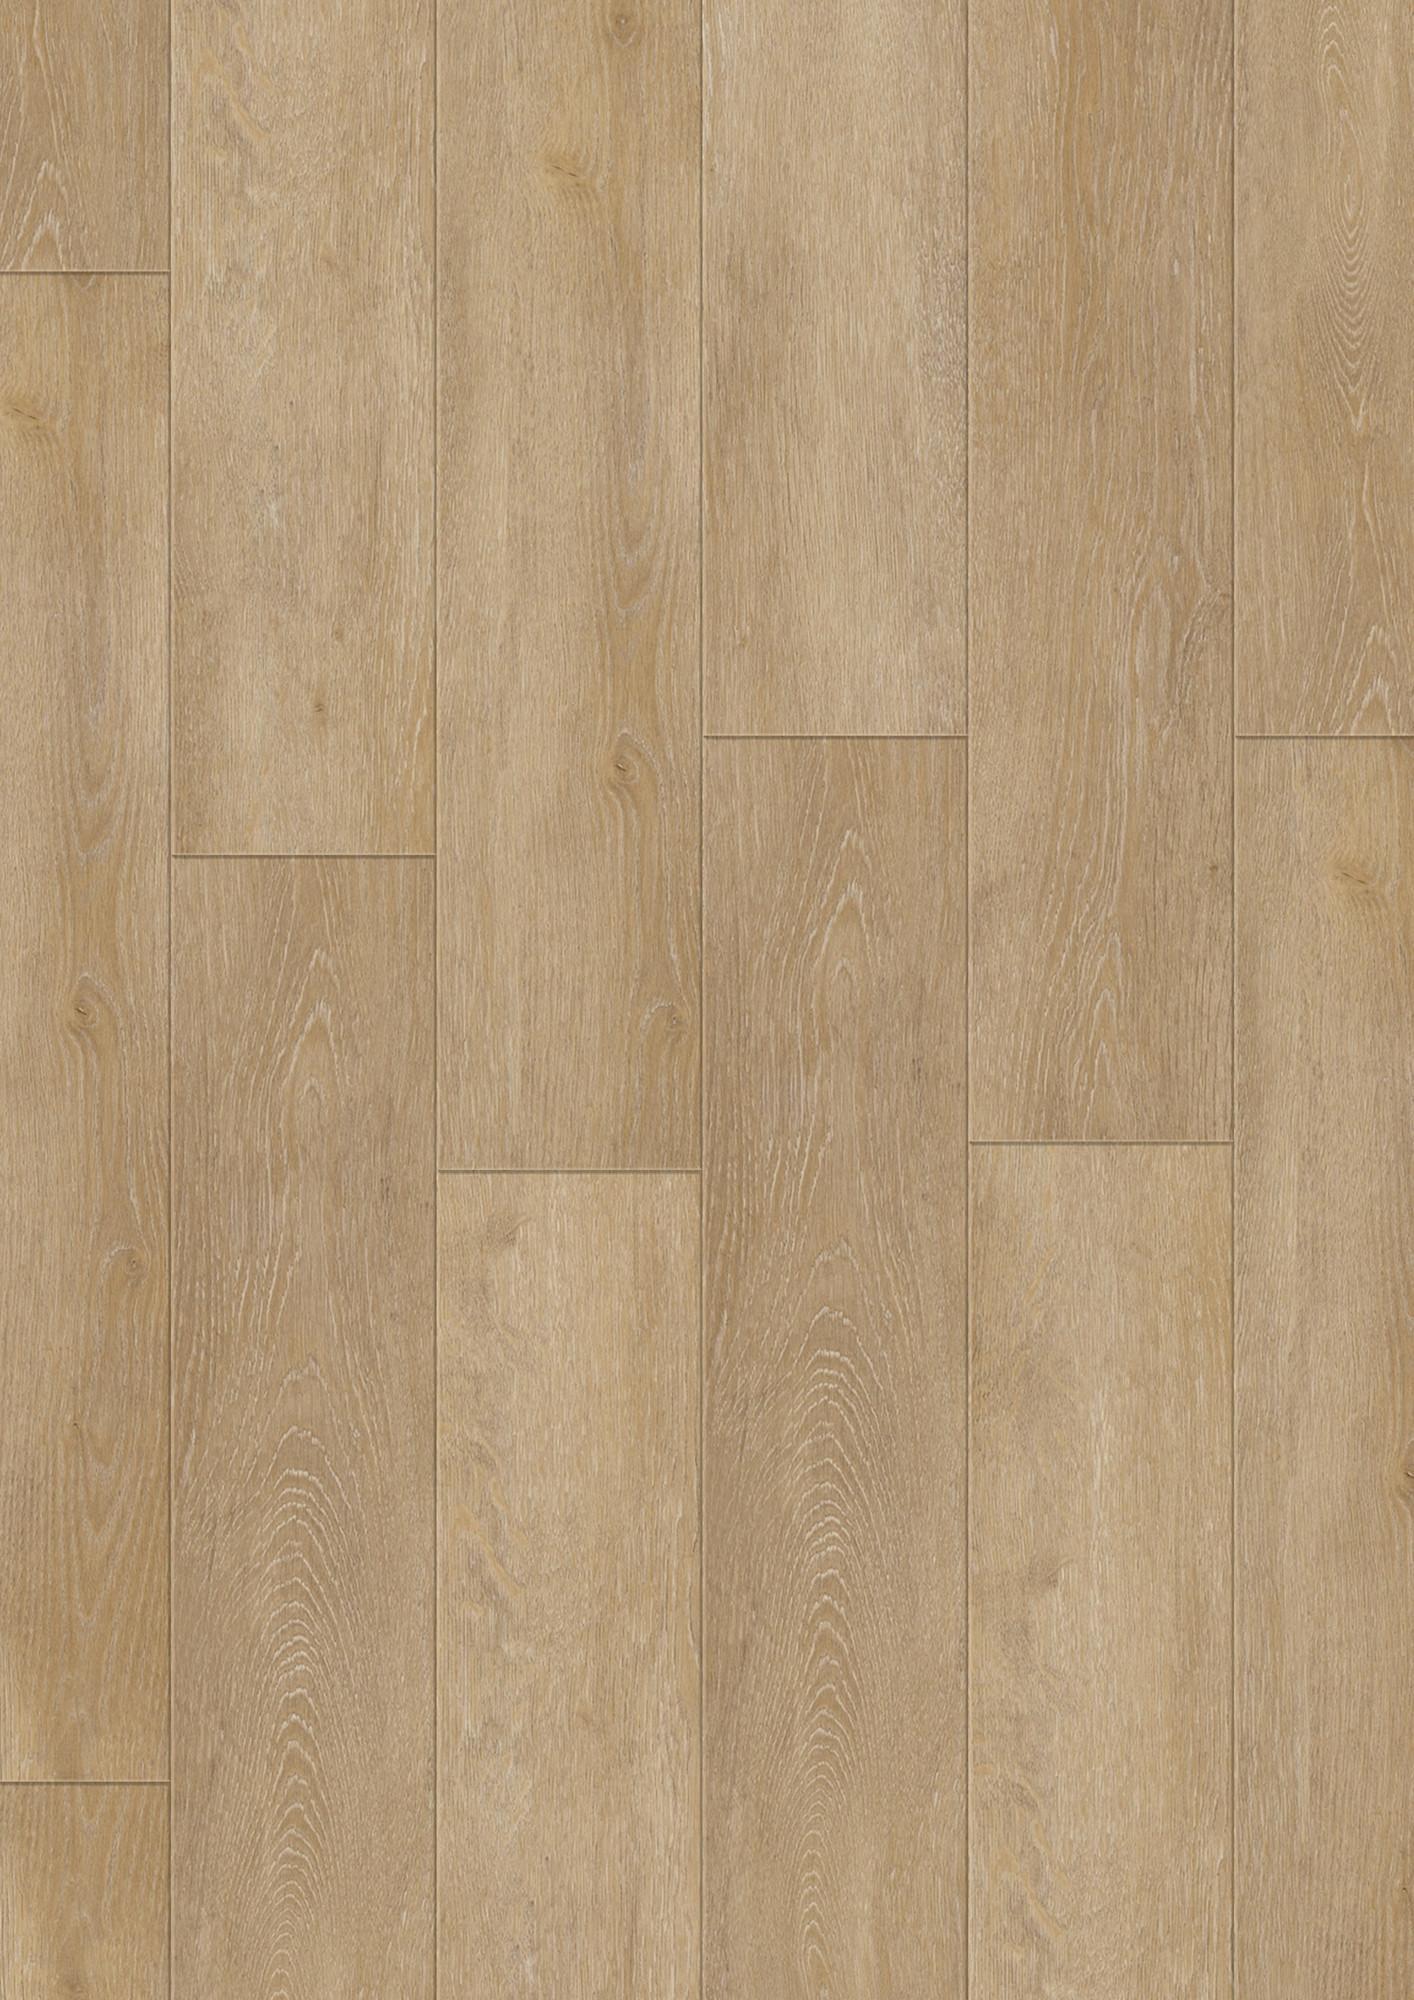 Gerflor Looselay 0441 - Honey Oak